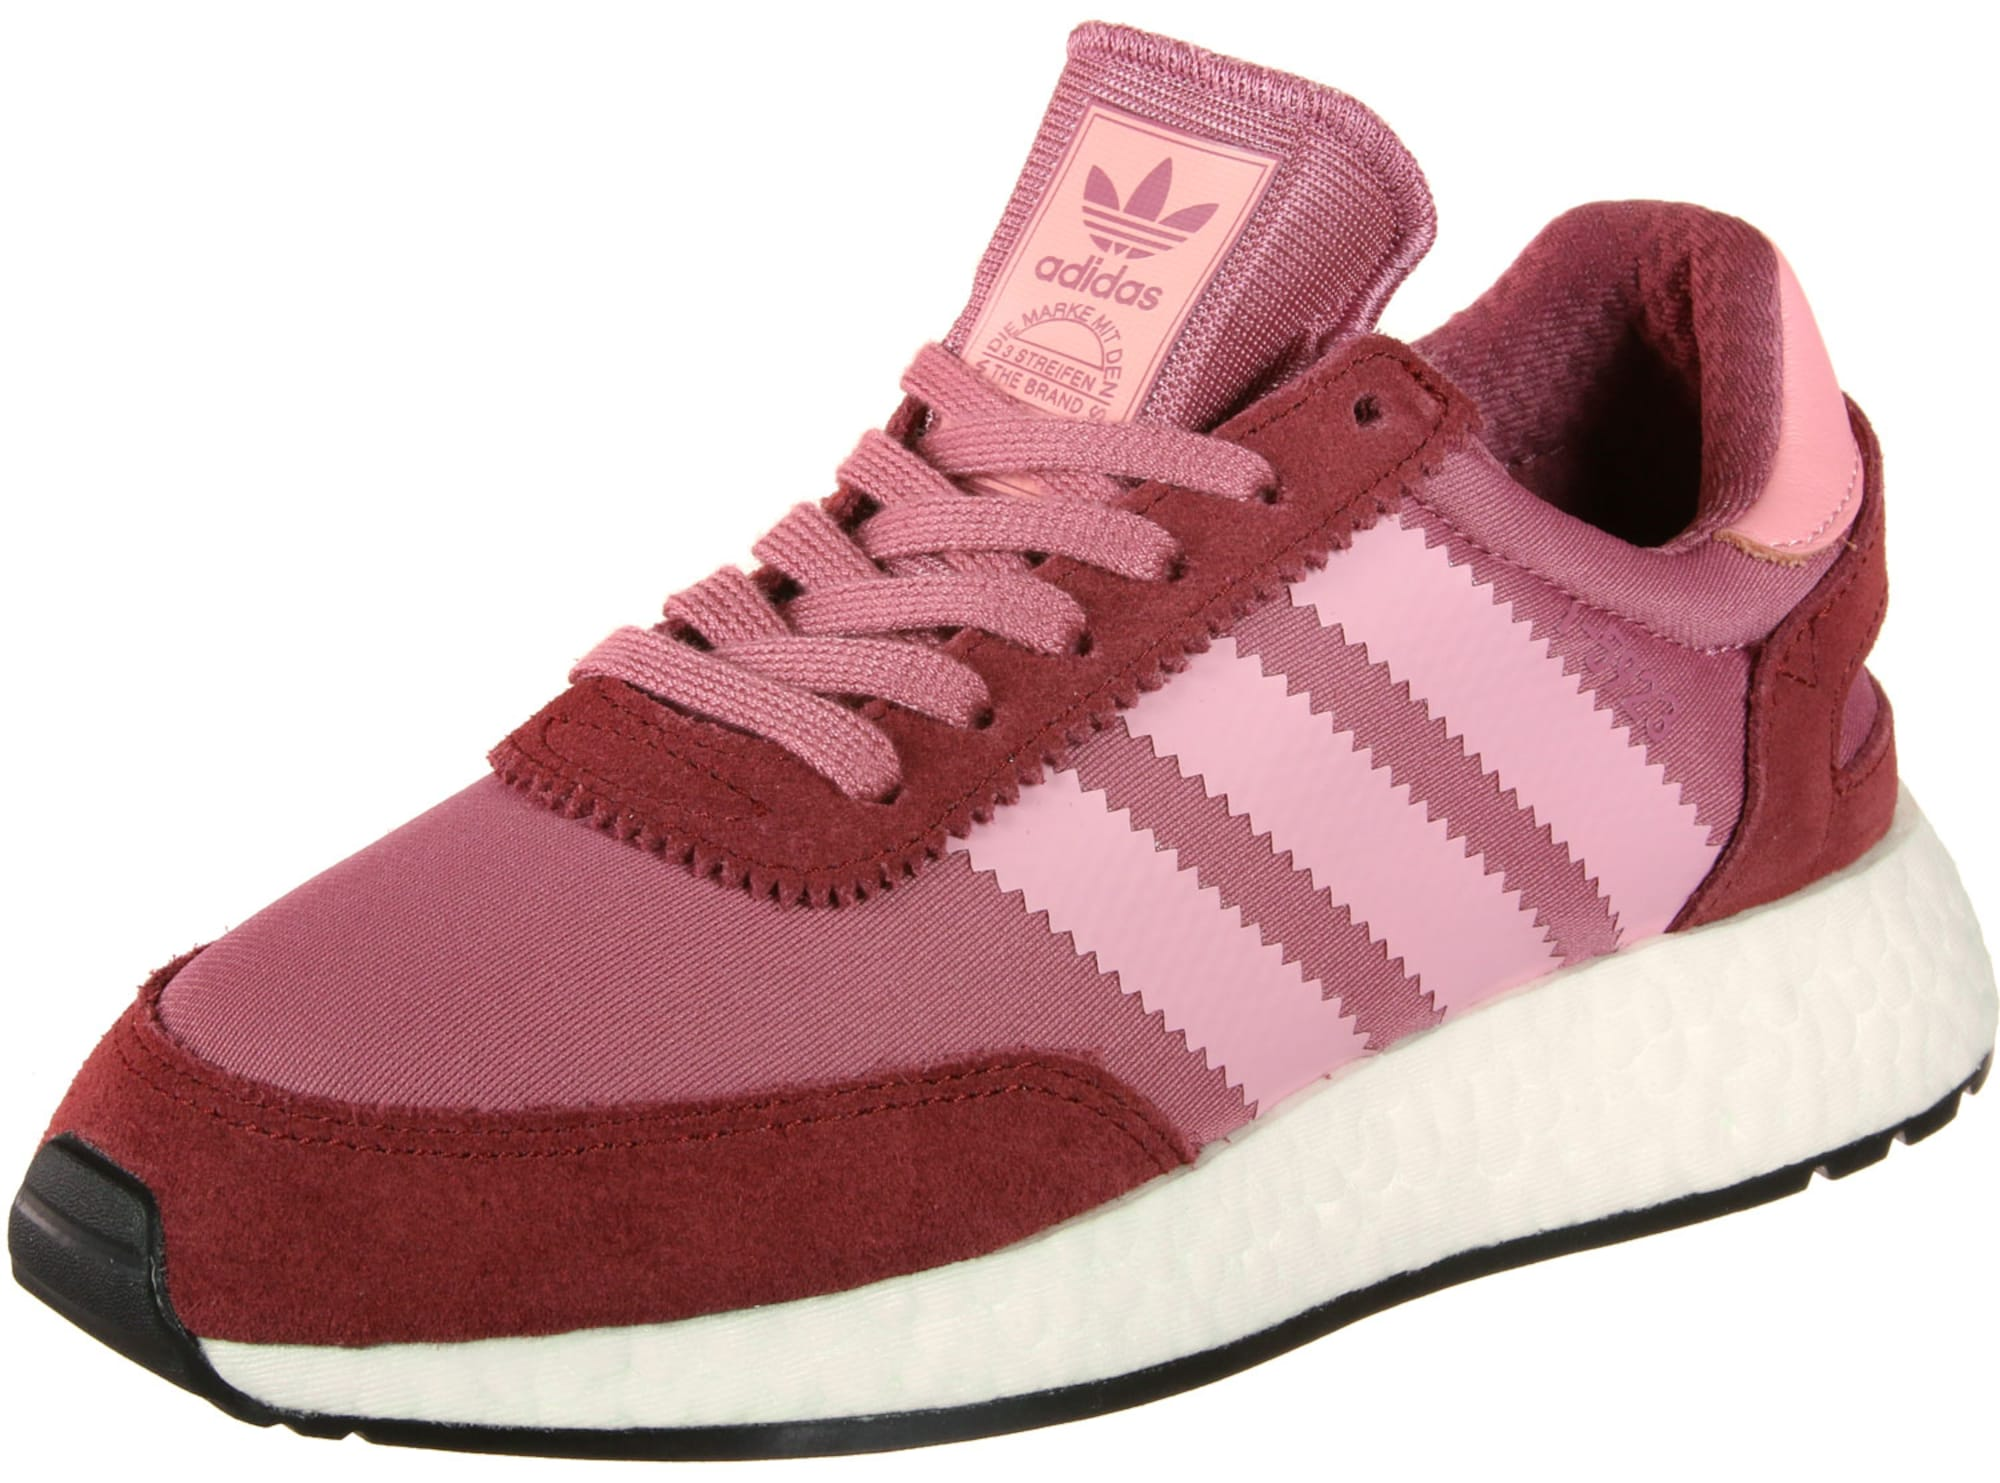 Aanbieding: Adidas Originals Dames Sneakers Laag I 5923